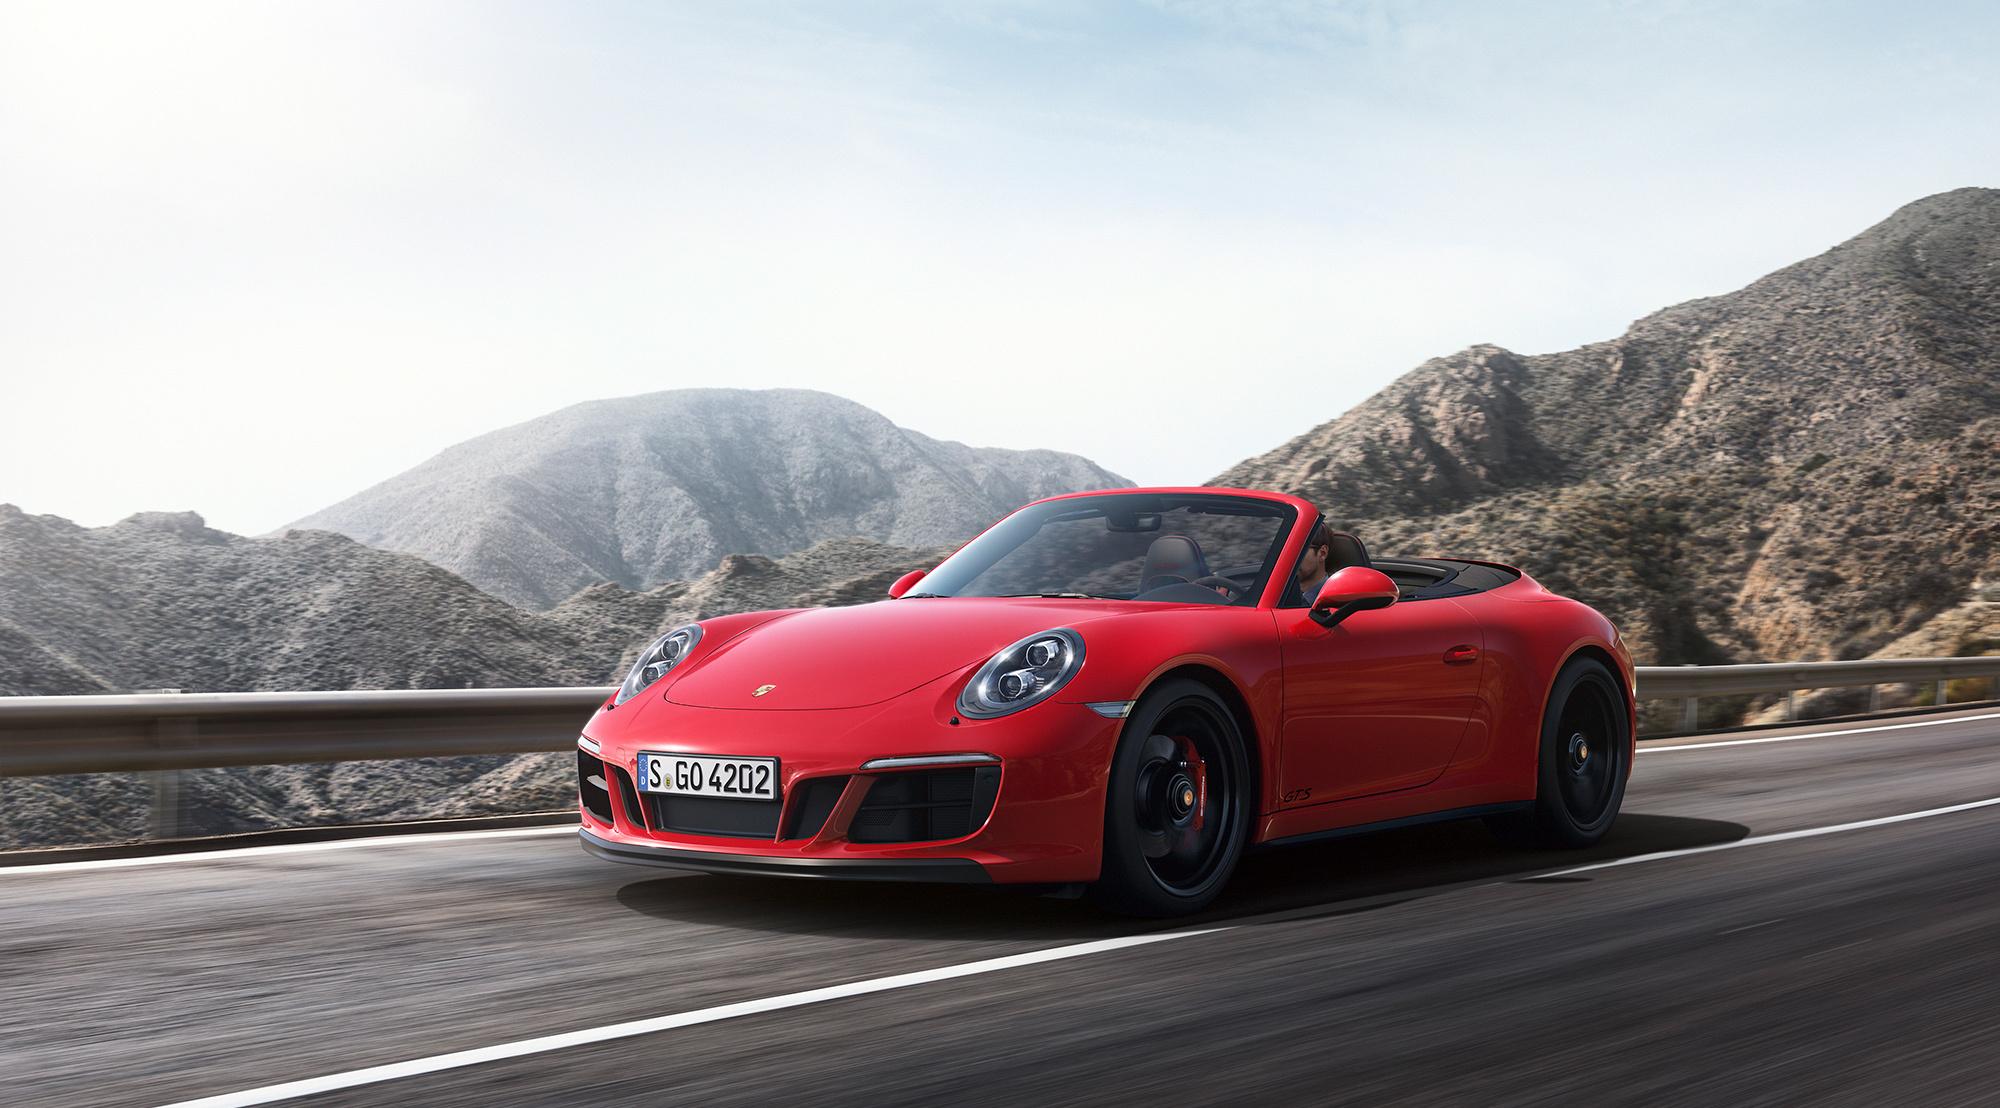 Pictures Of Porsche 911 Gts Cabriolet